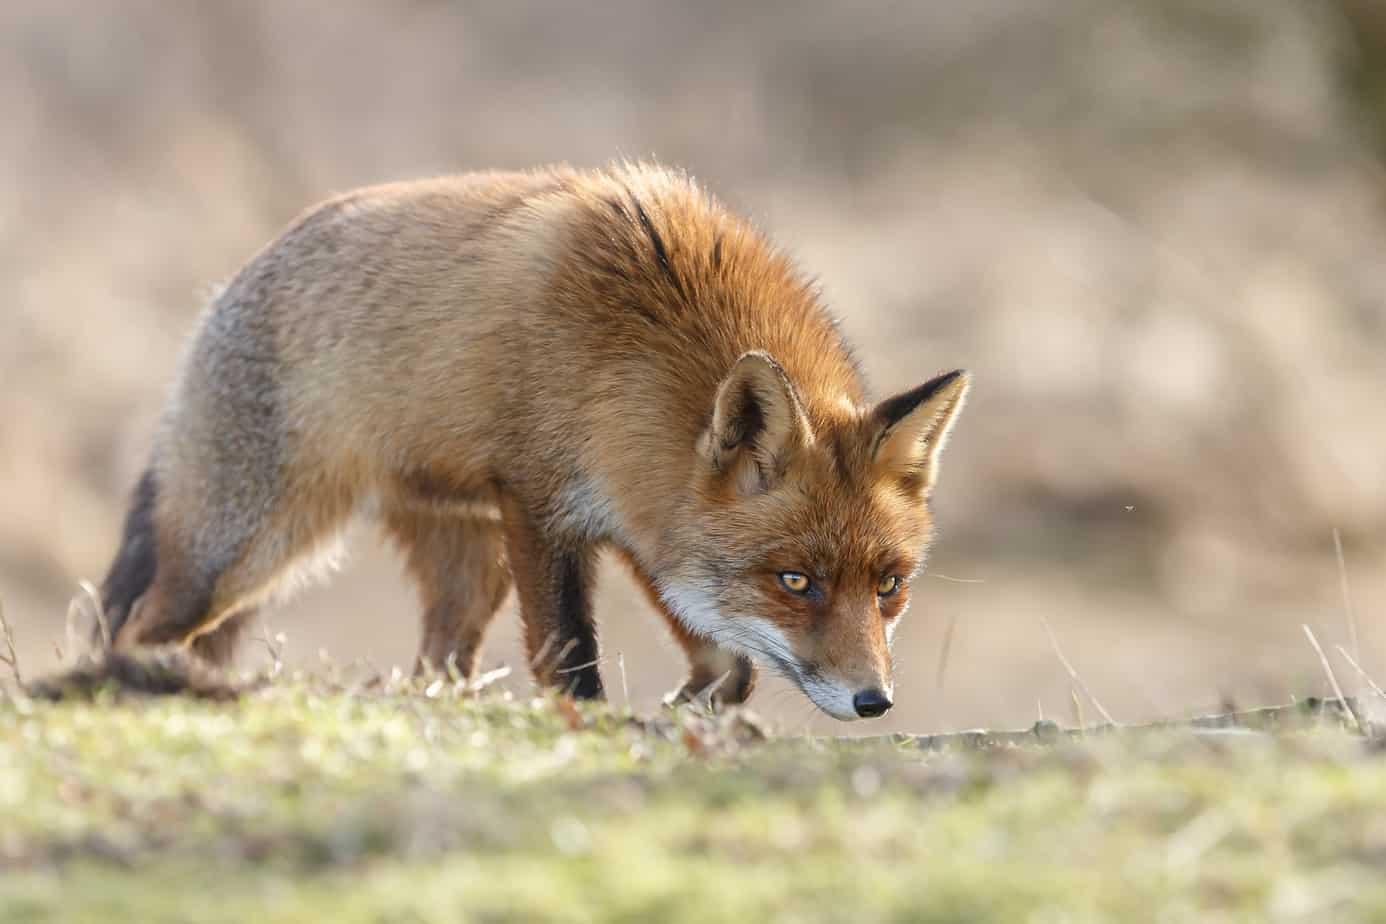 Fox Deterrent Strategies That Actually Work